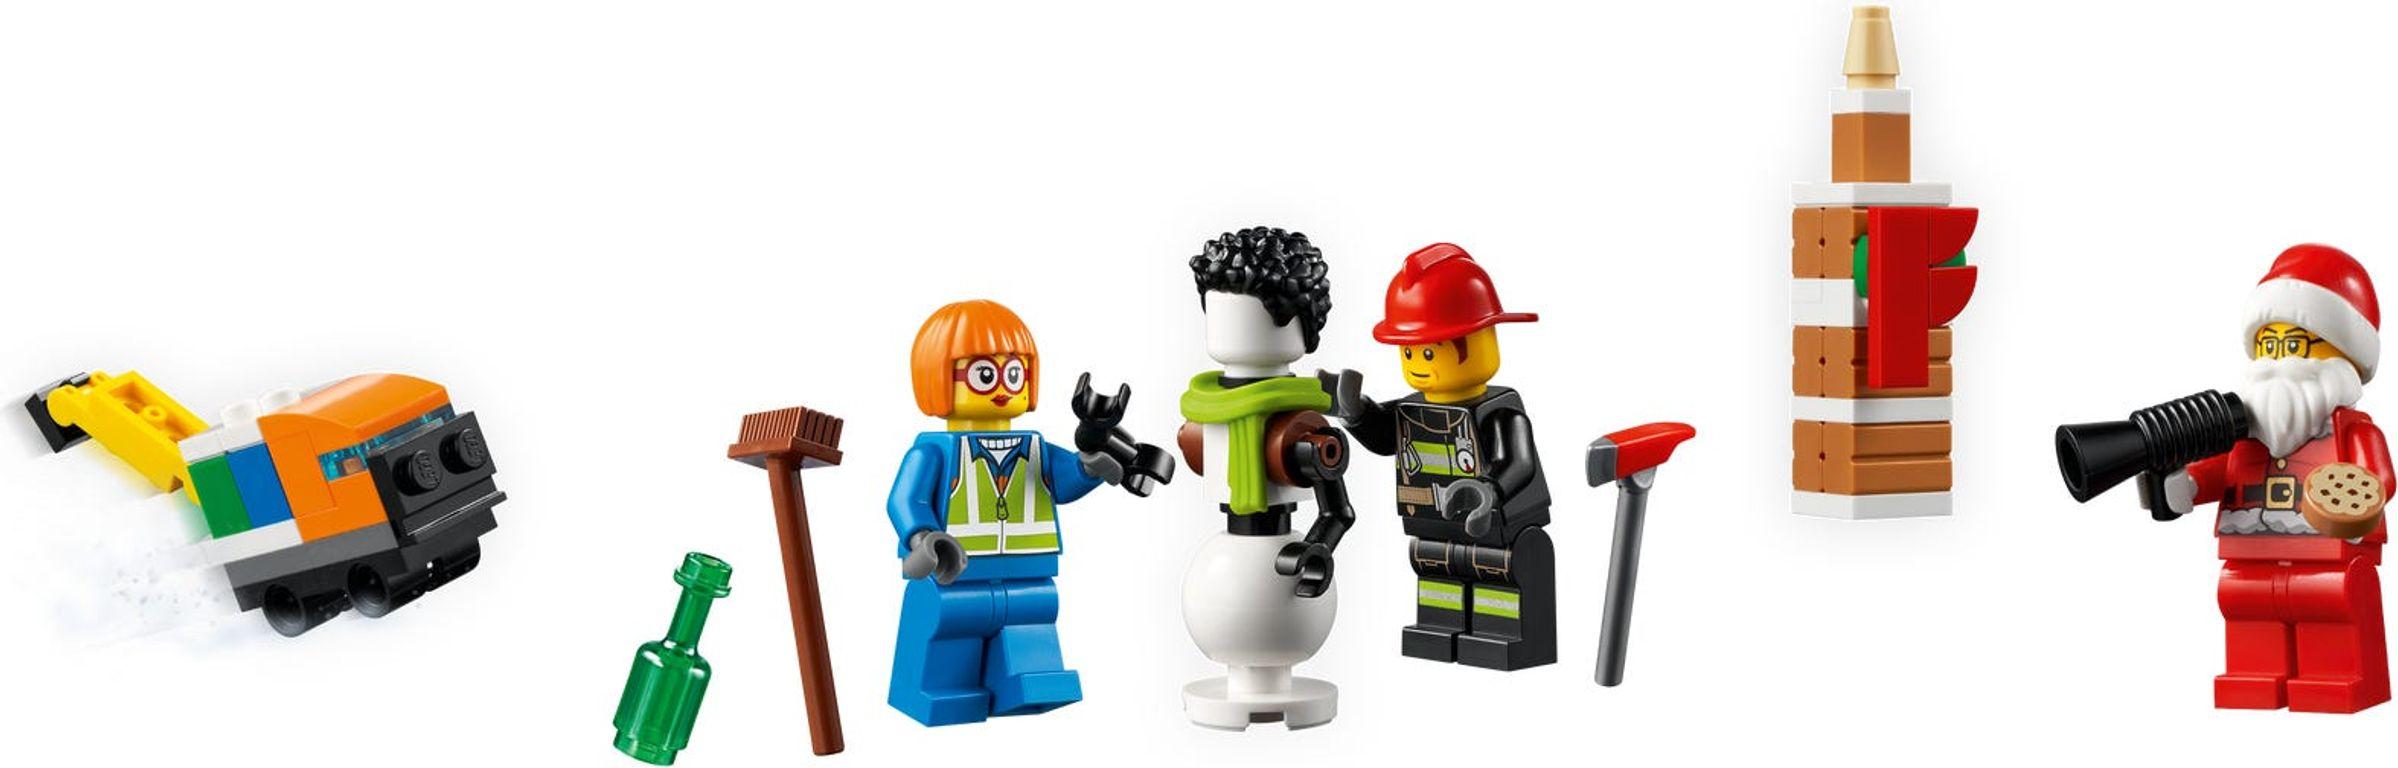 LEGO® City Advent Calendar 2021 gameplay